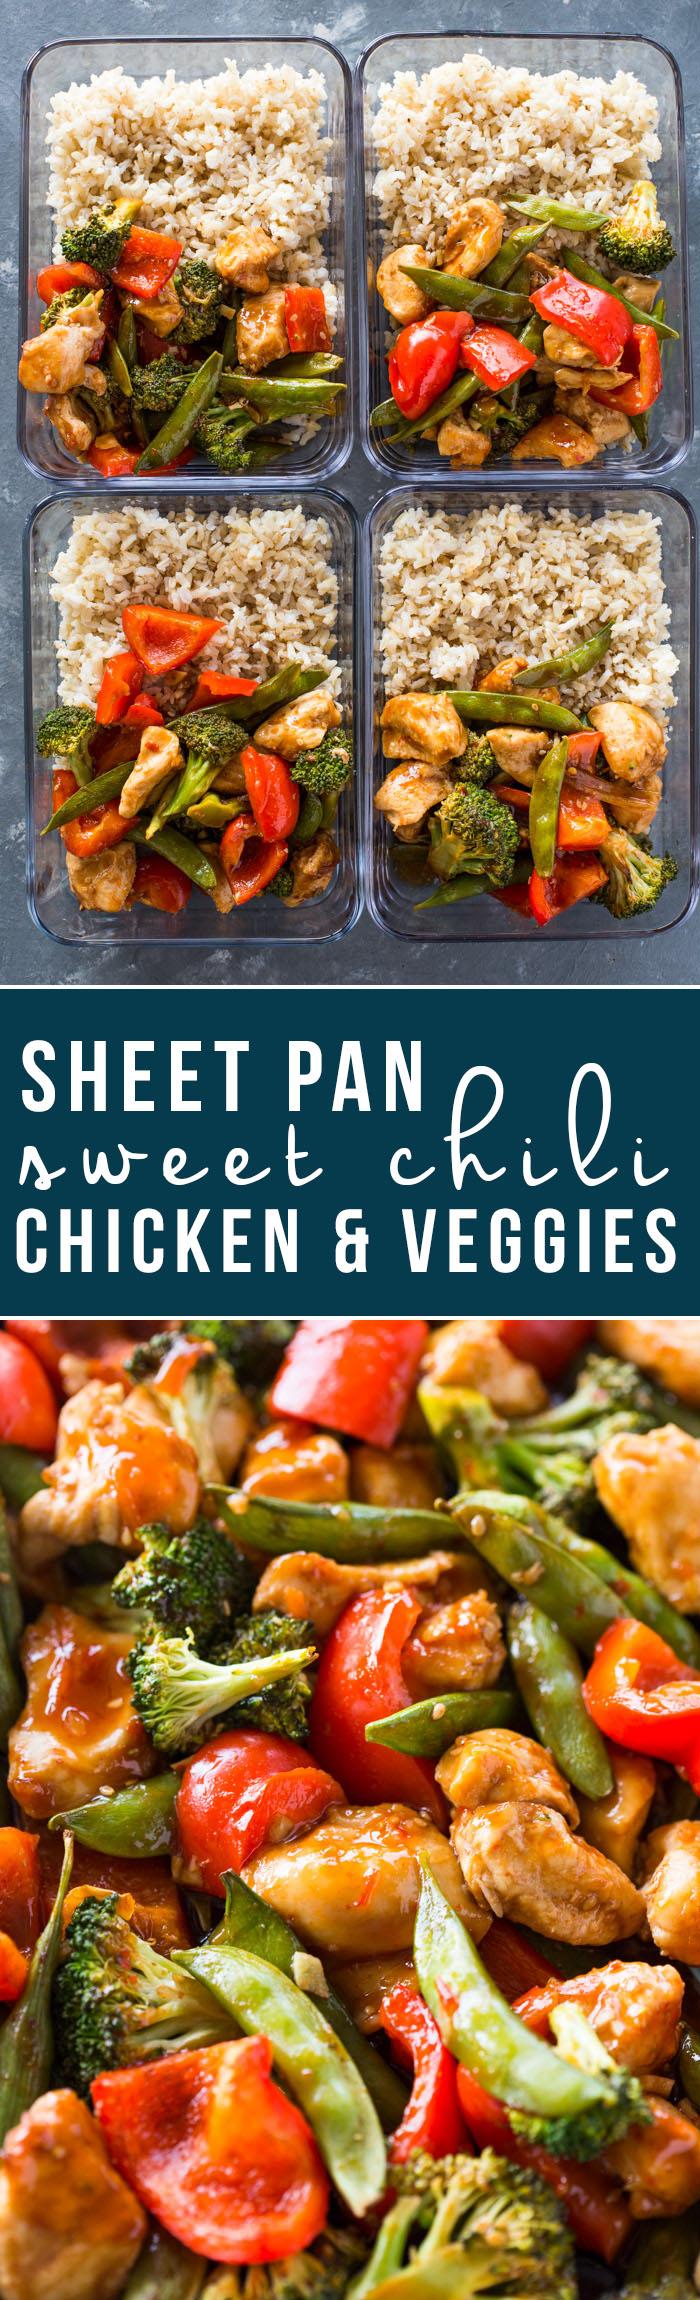 Sheet Pan Sweet Chili Chicken & Veggies